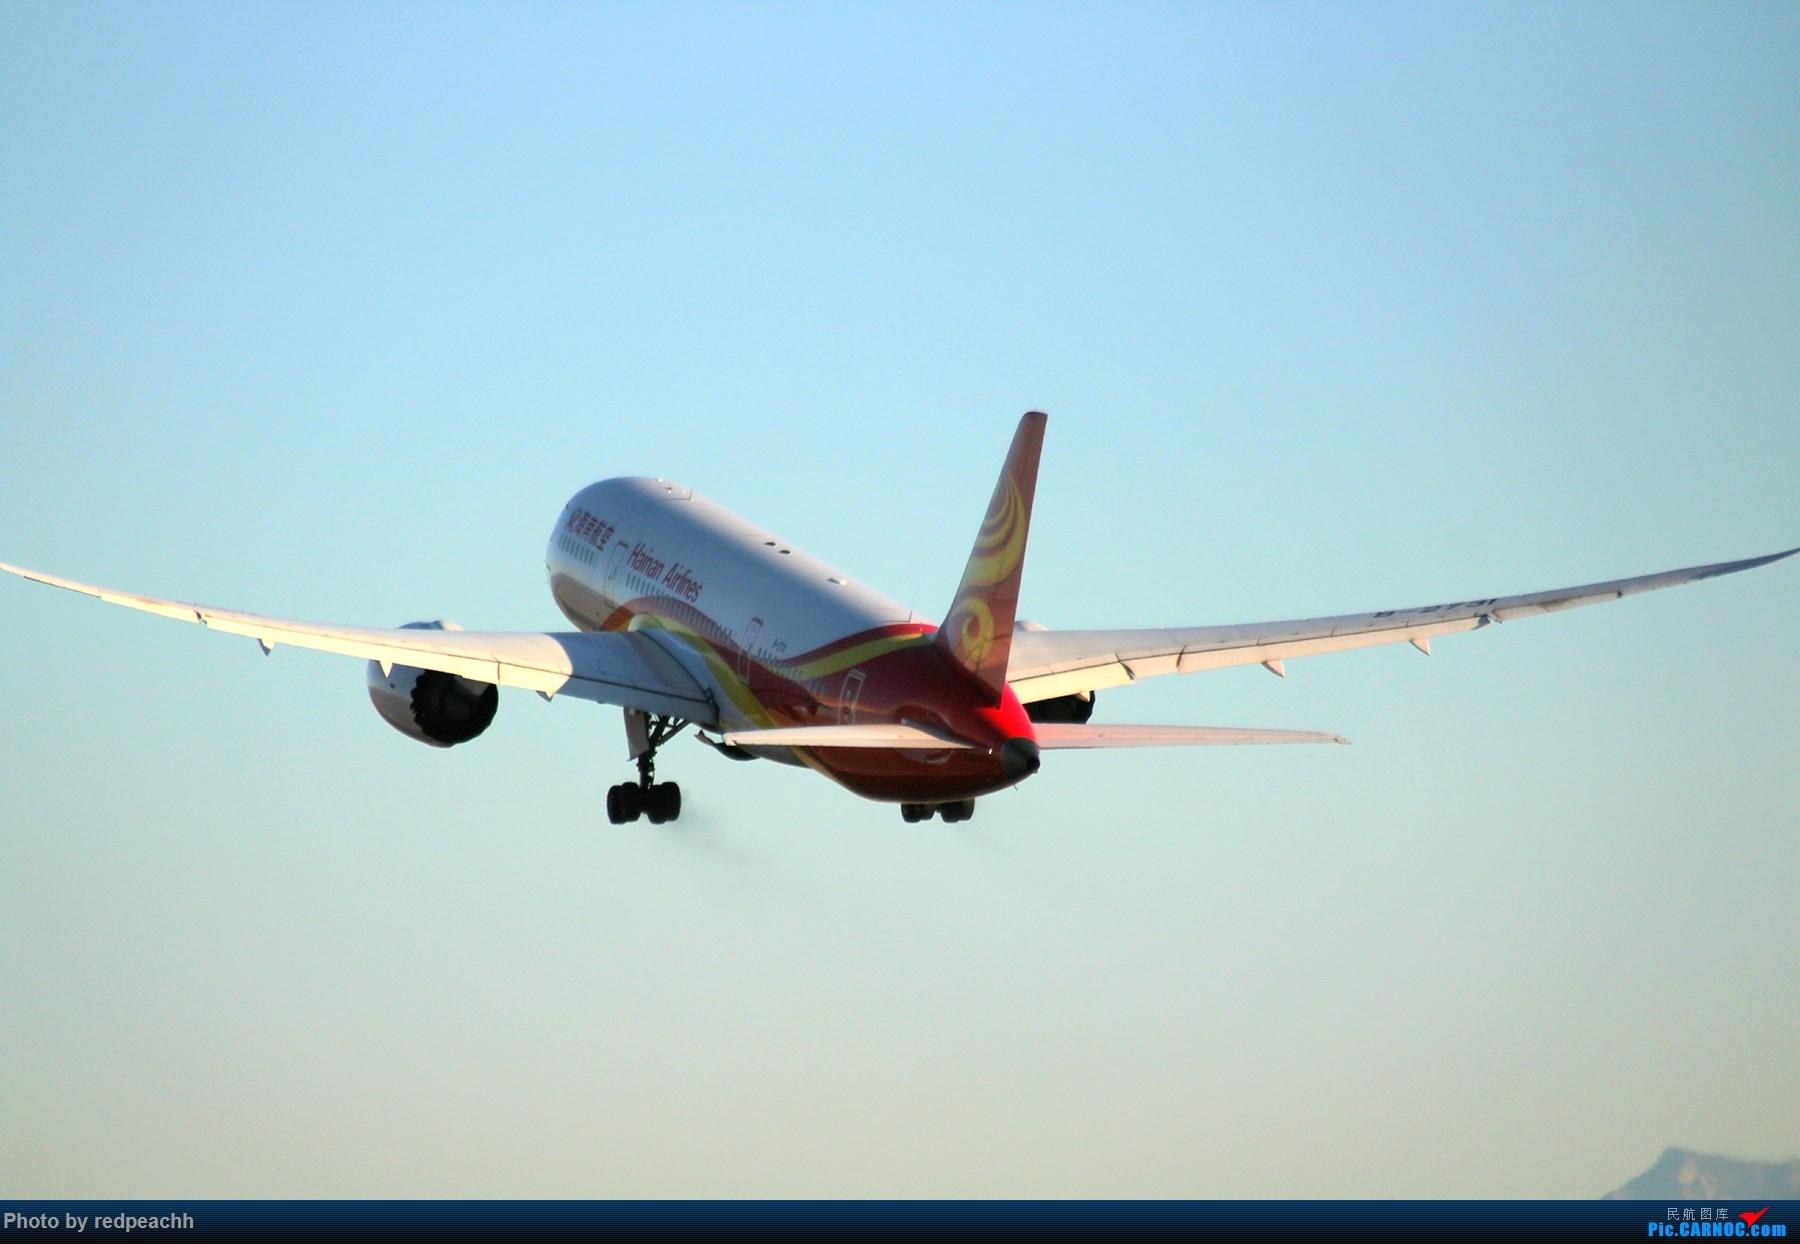 Re:[原创]河北人为拍机而首都机场2日游虽常规但值得纪念(36L) BOEING 787-8 B-2731 中国北京首都国际机场